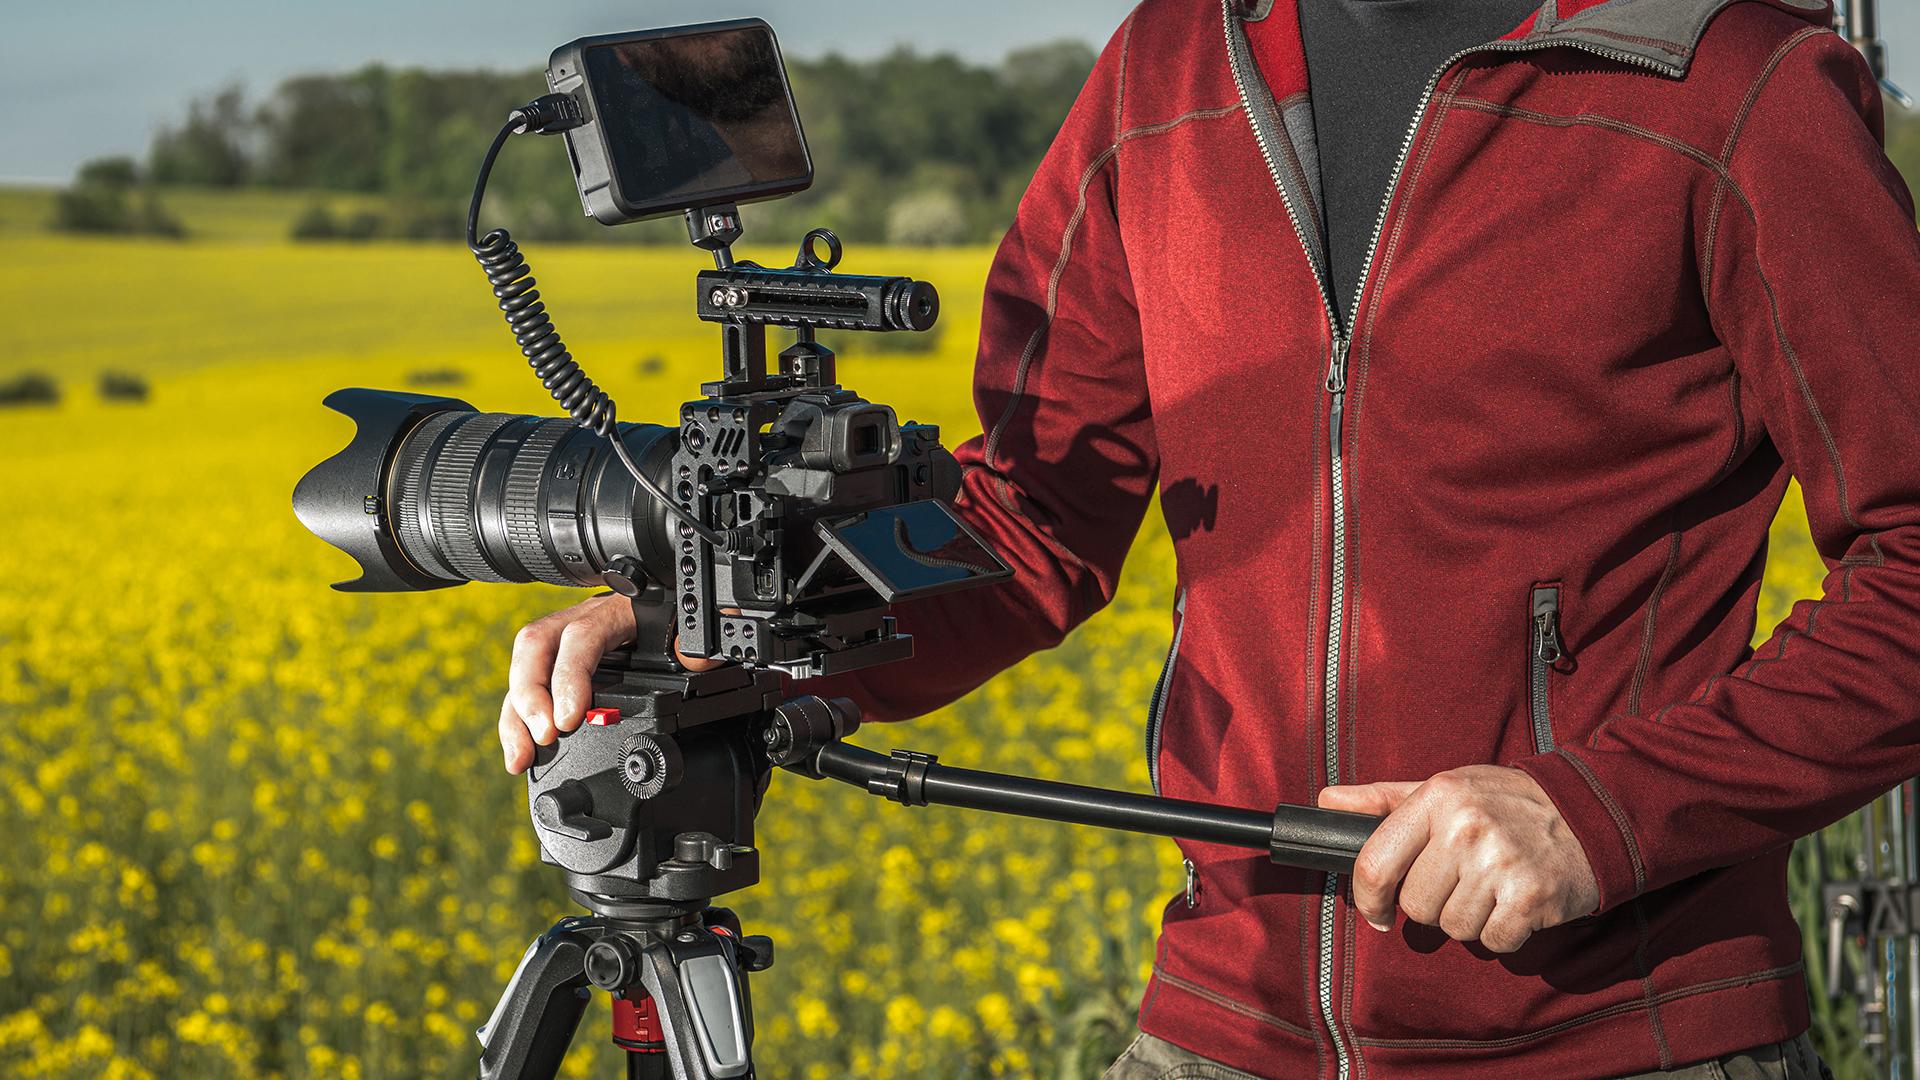 Productora Audiovisual